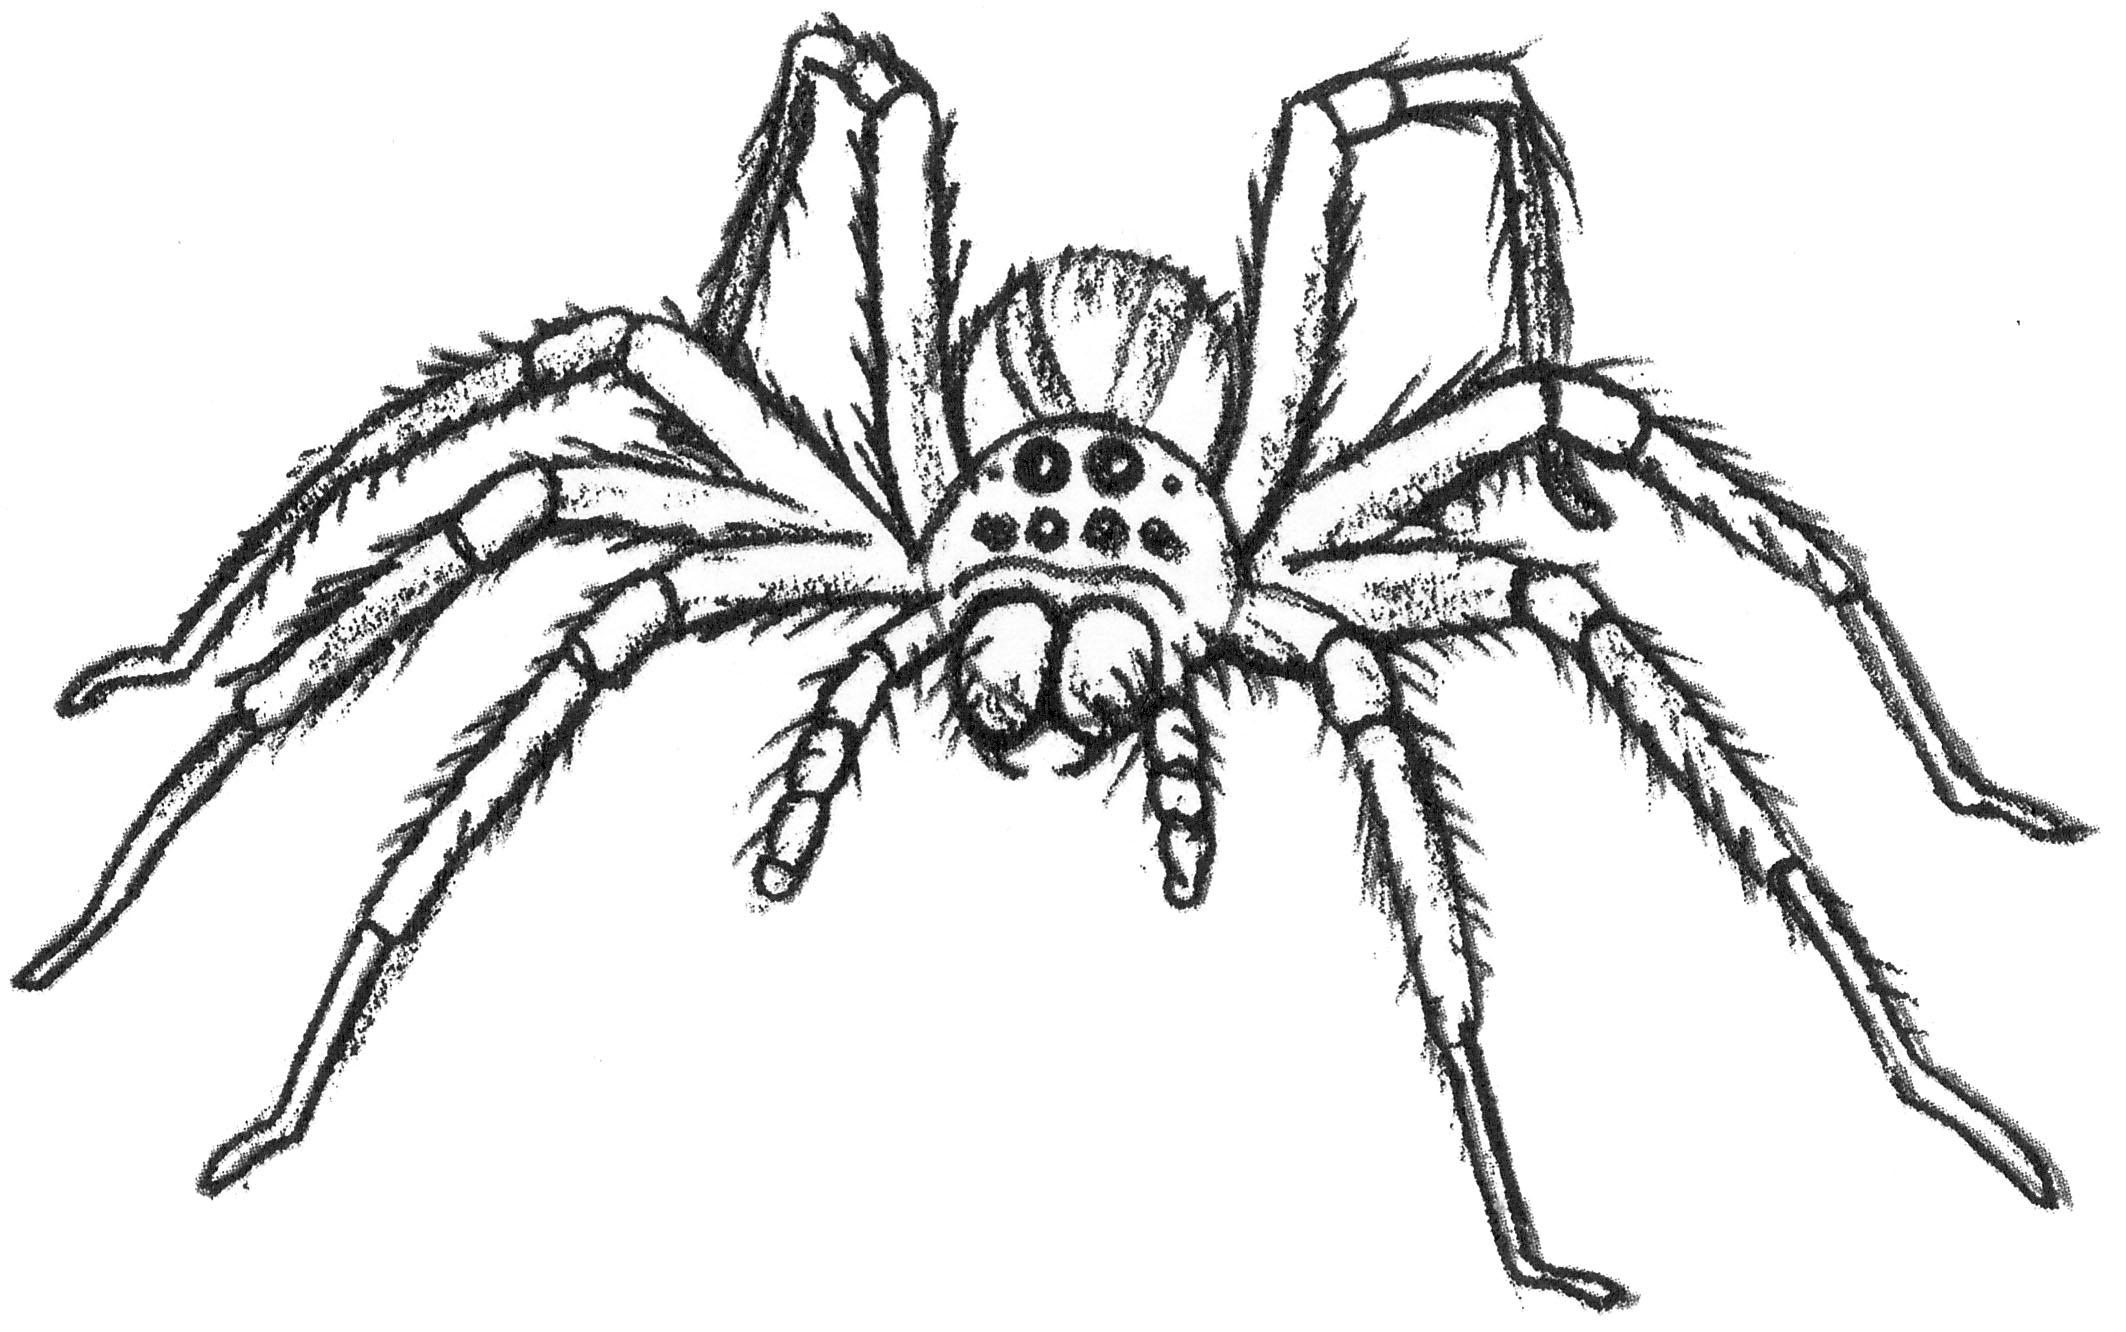 2017-Aude-insecte-illlustration